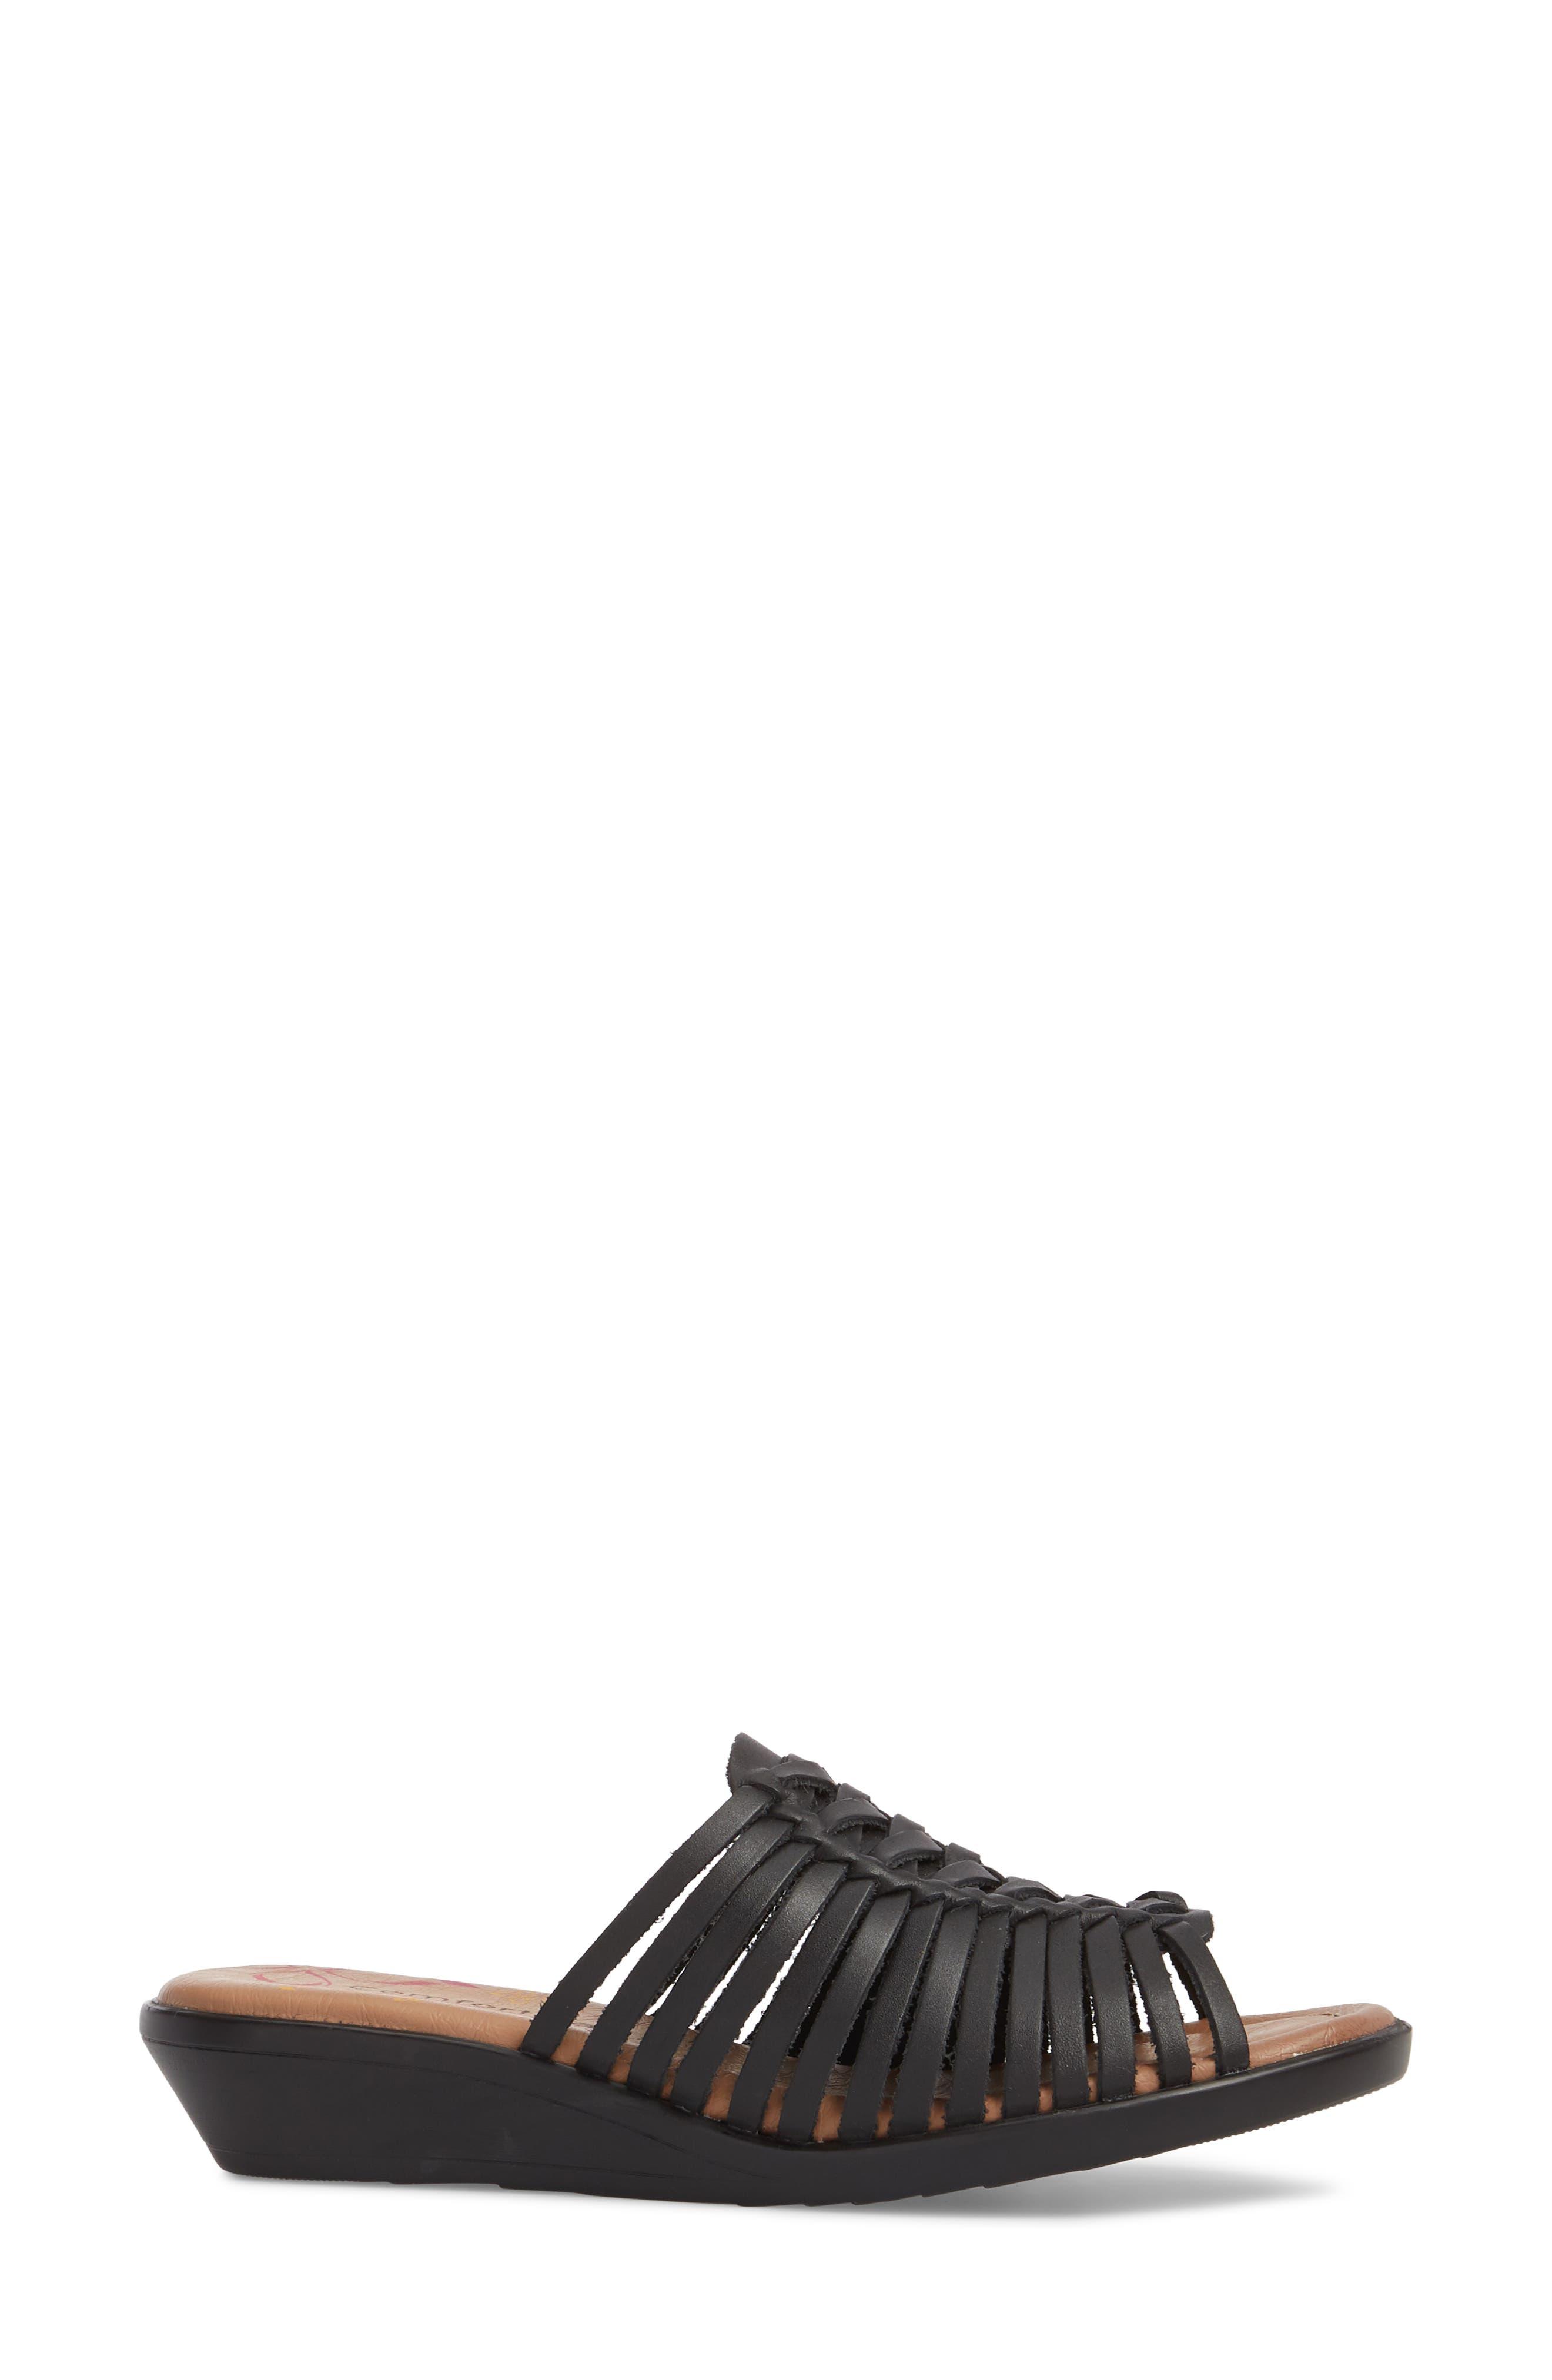 Felida Huarache Slide Sandal,                             Alternate thumbnail 3, color,                             Black Leather